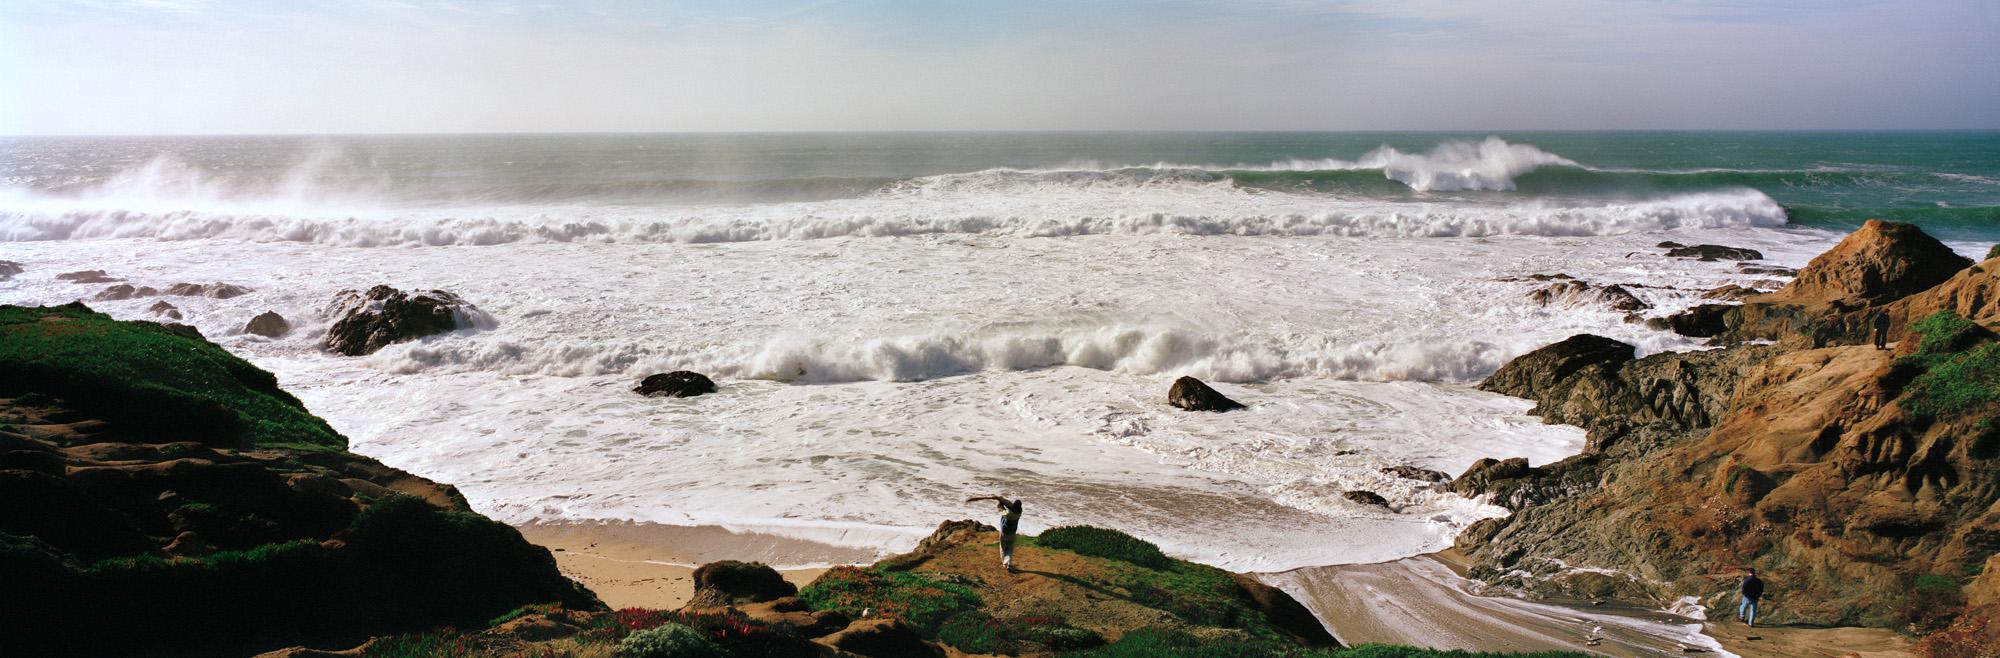 Batting, Bodega Head, California, 1998